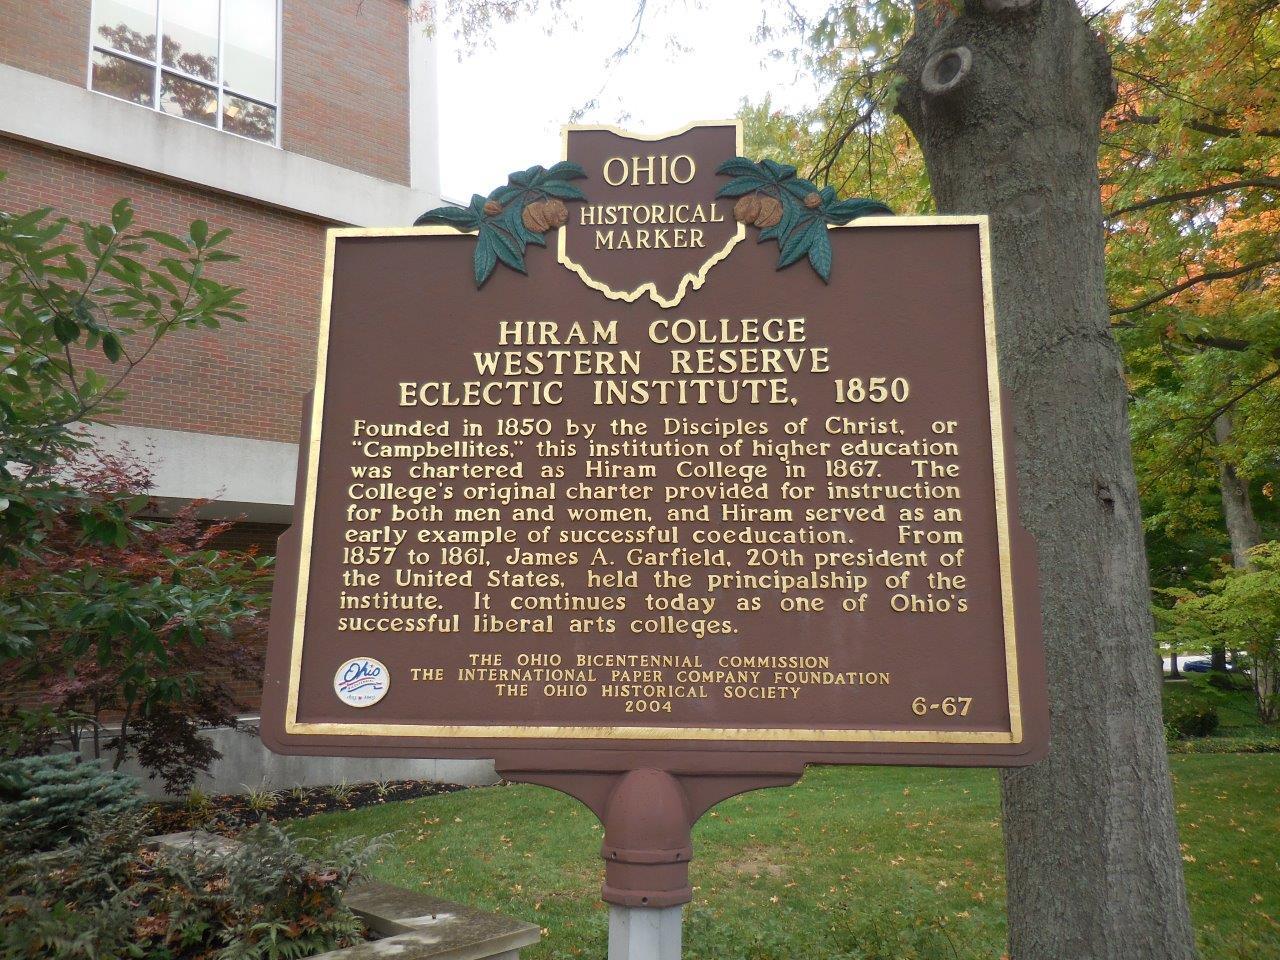 James Garfield Historical Marker at Hiram College